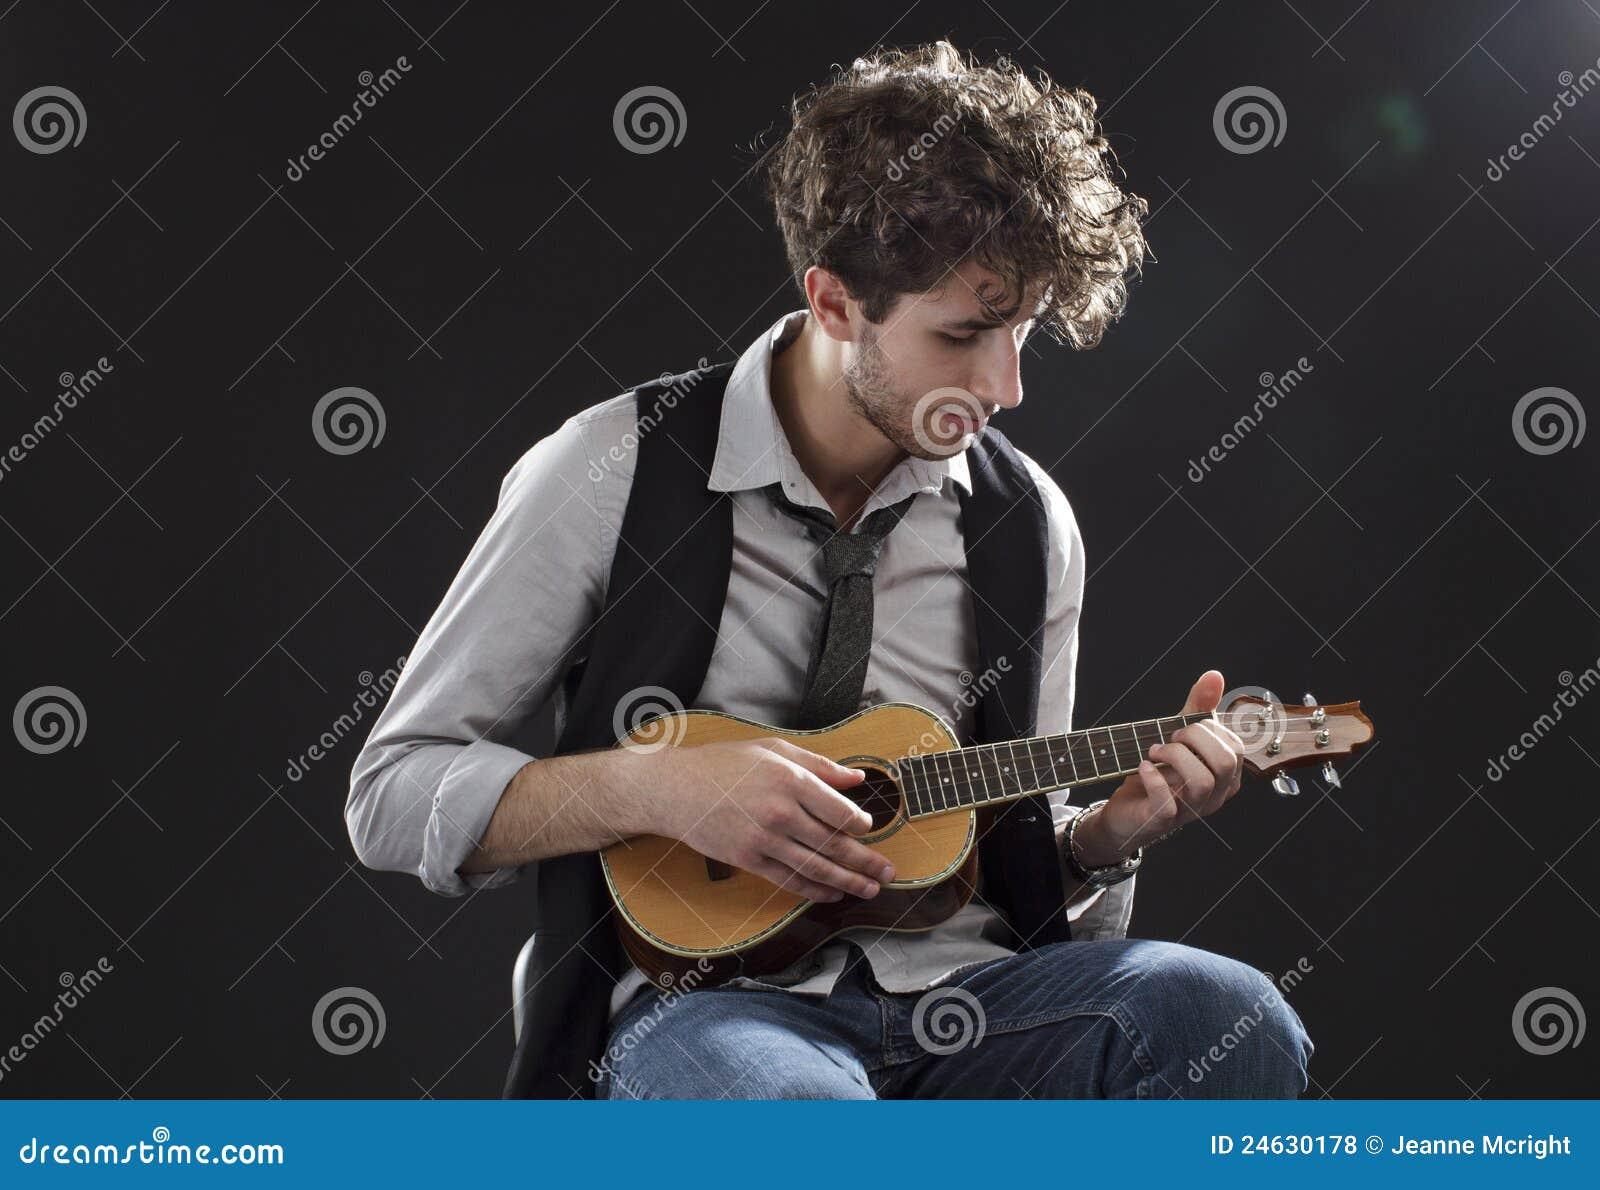 Image result for playing a ukulele